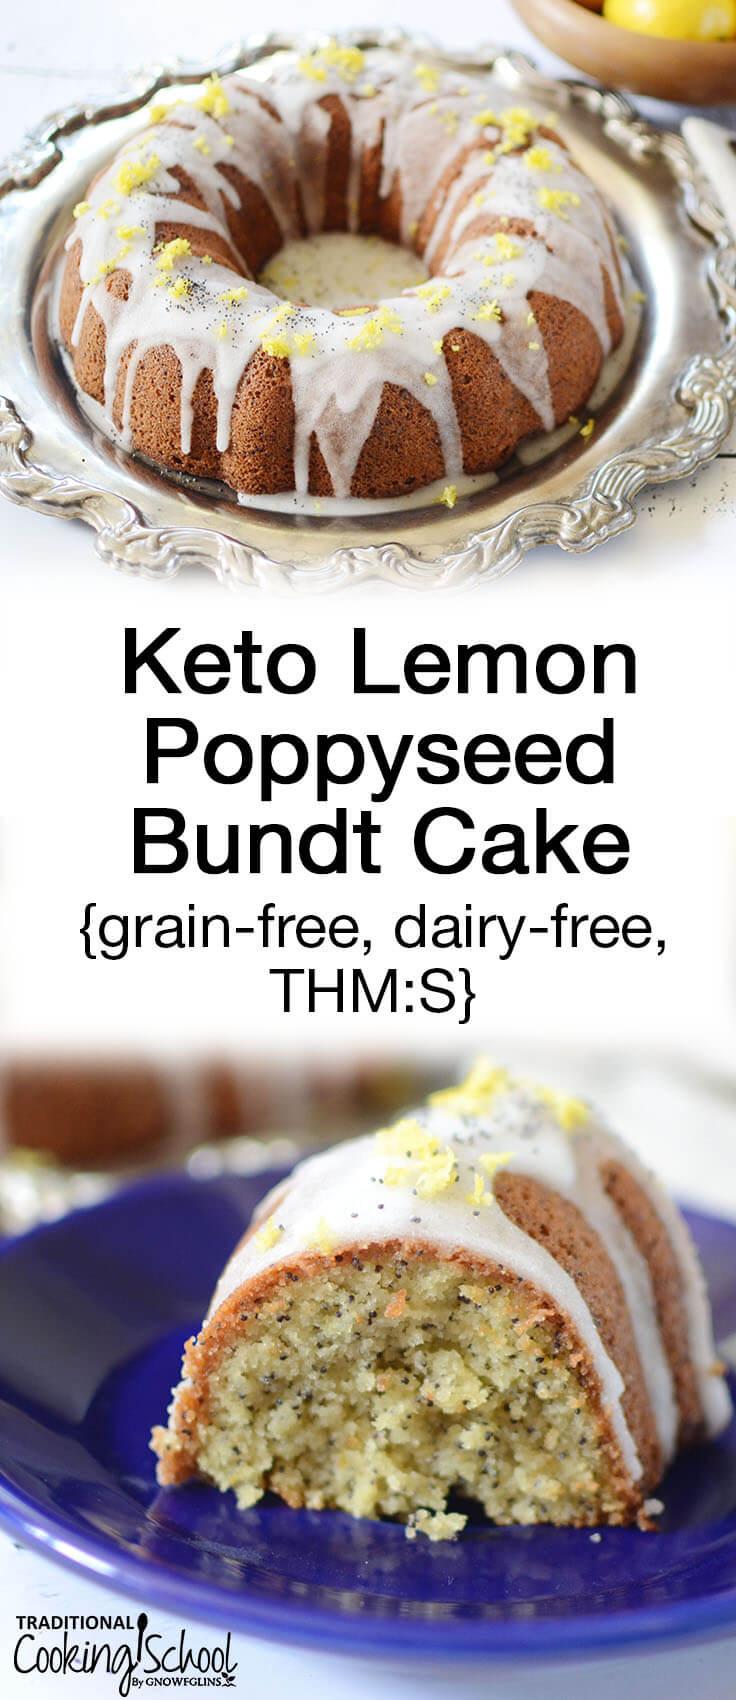 keto lemon poppyseed bundt cake